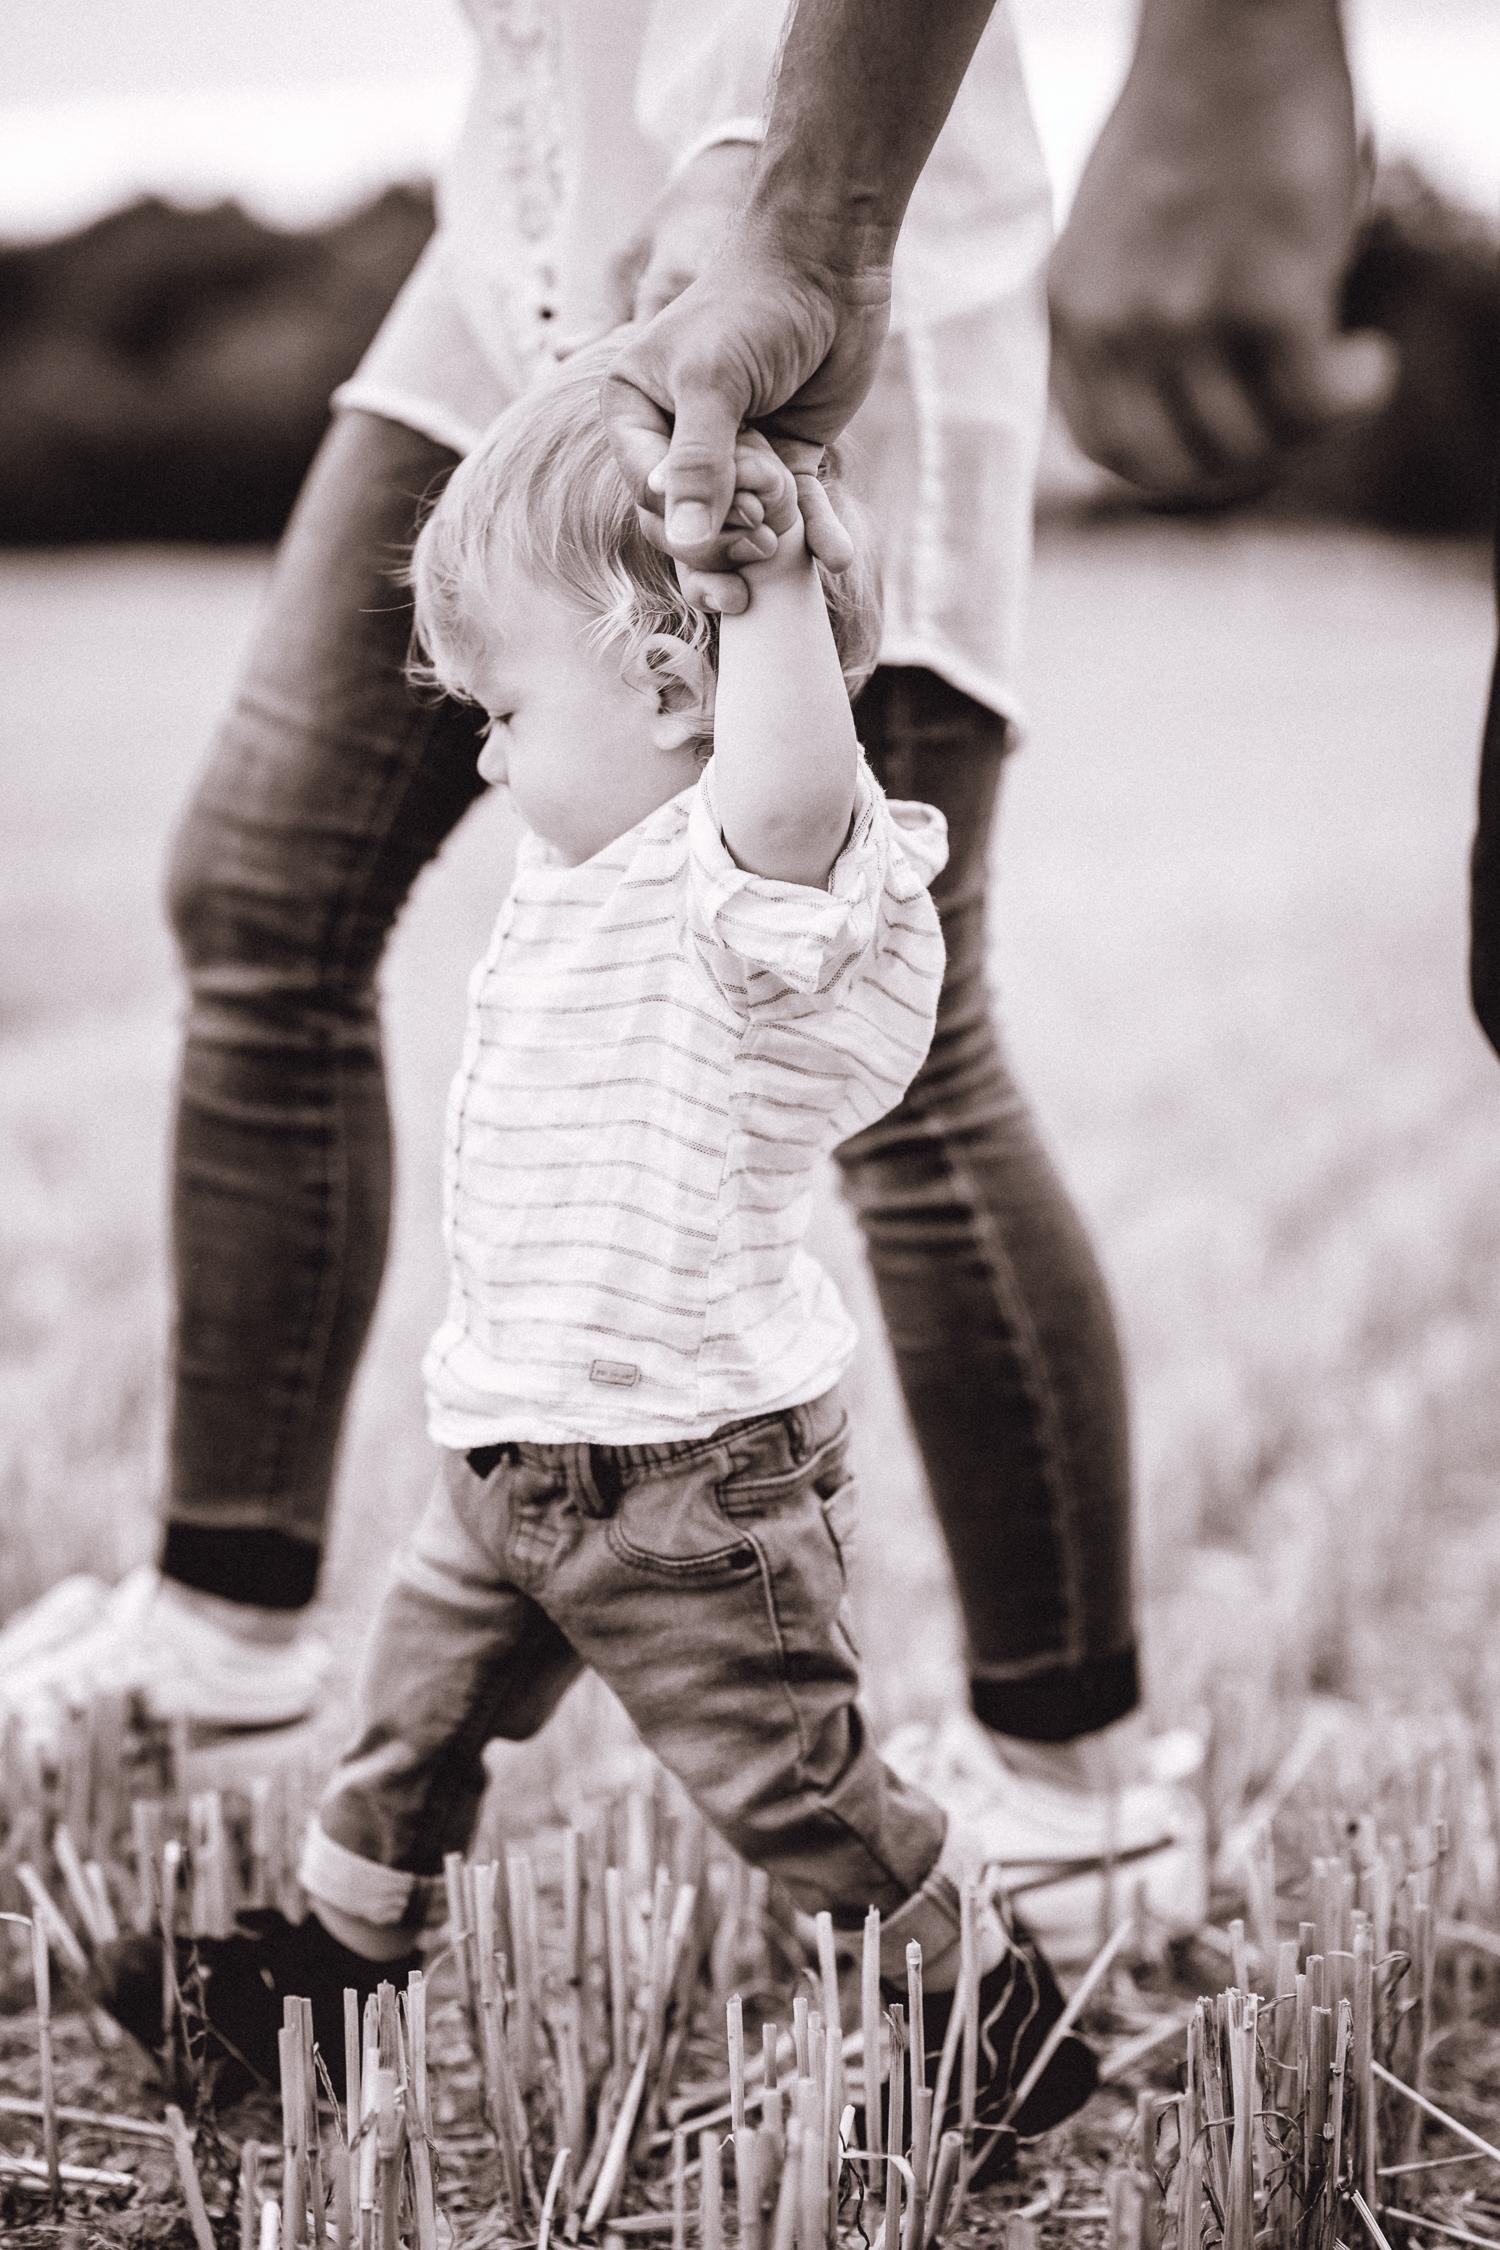 Little Foot Fotografie - Lara Czymerys - Babyfotos Mülheim - Fotostudio Essen - Babyfotografin Oberhausen - Newbornfotgrafie Mülheim - Familienfotograf Ruhrgebiet - Fotostudio Düsseldorf